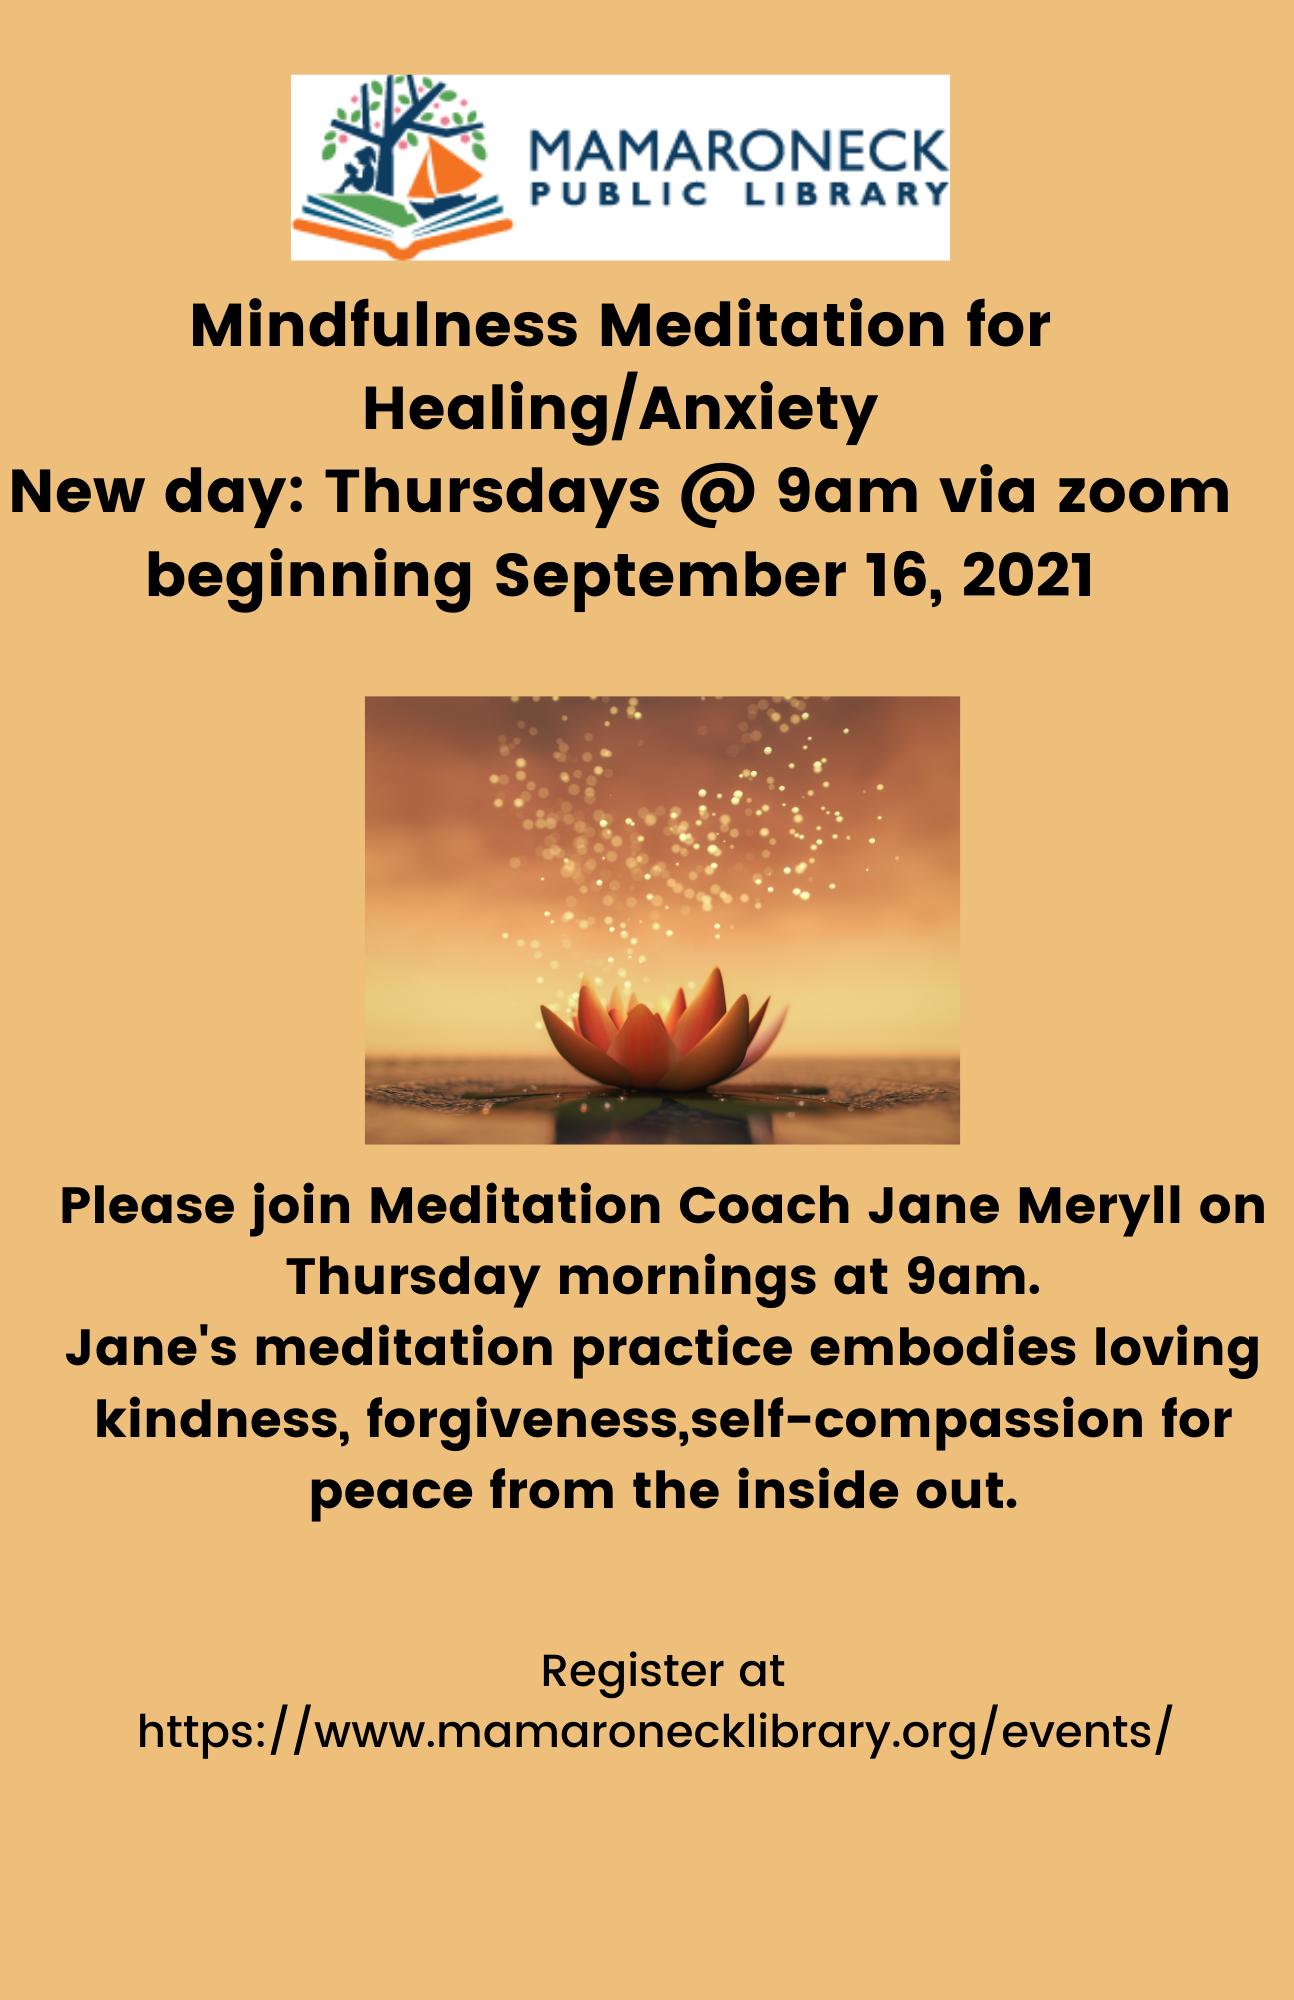 flyer announcing Fall Thursday morning meditation schedule